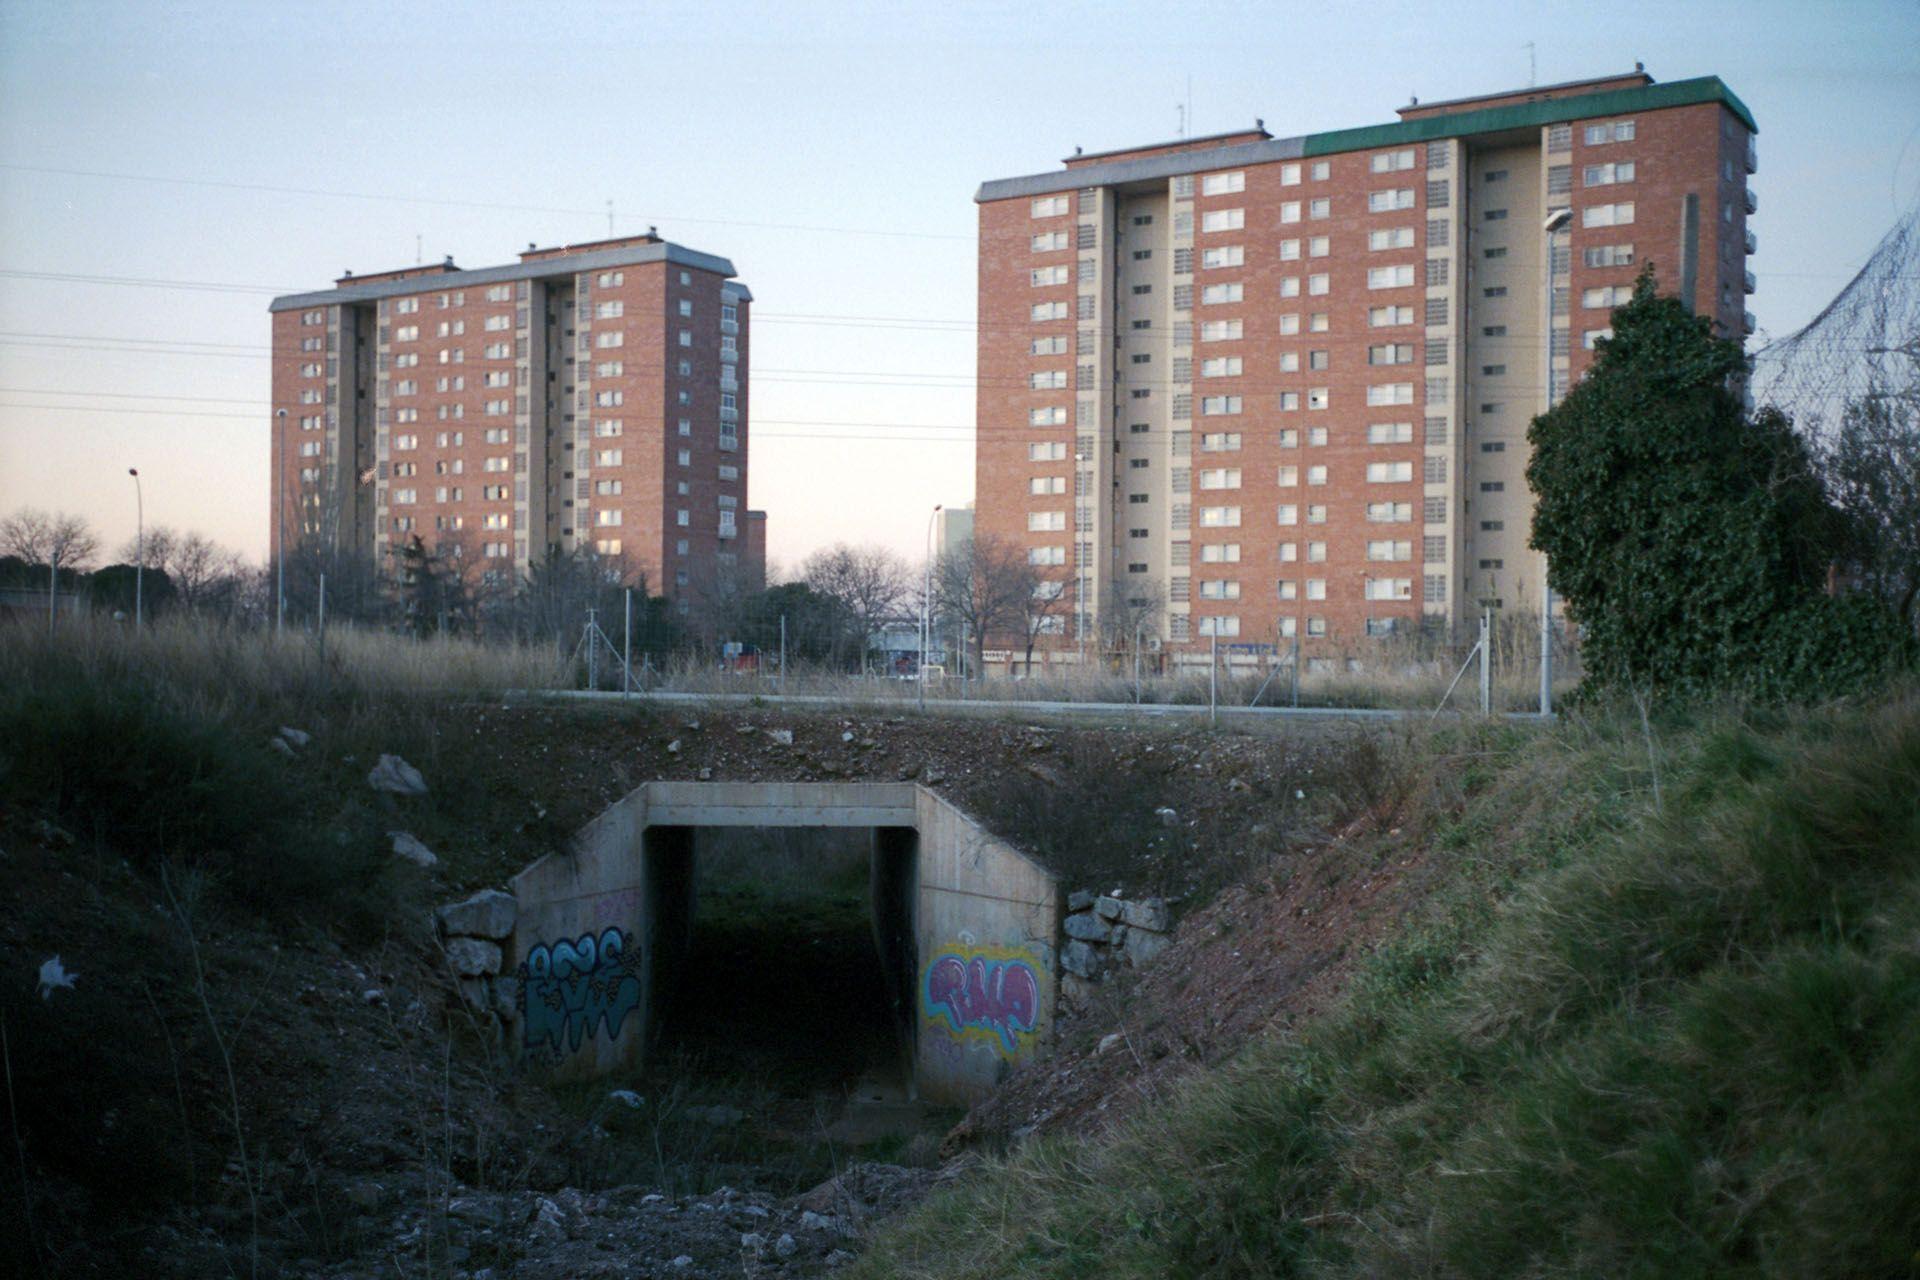 tunel_torrent_edificis_1920px